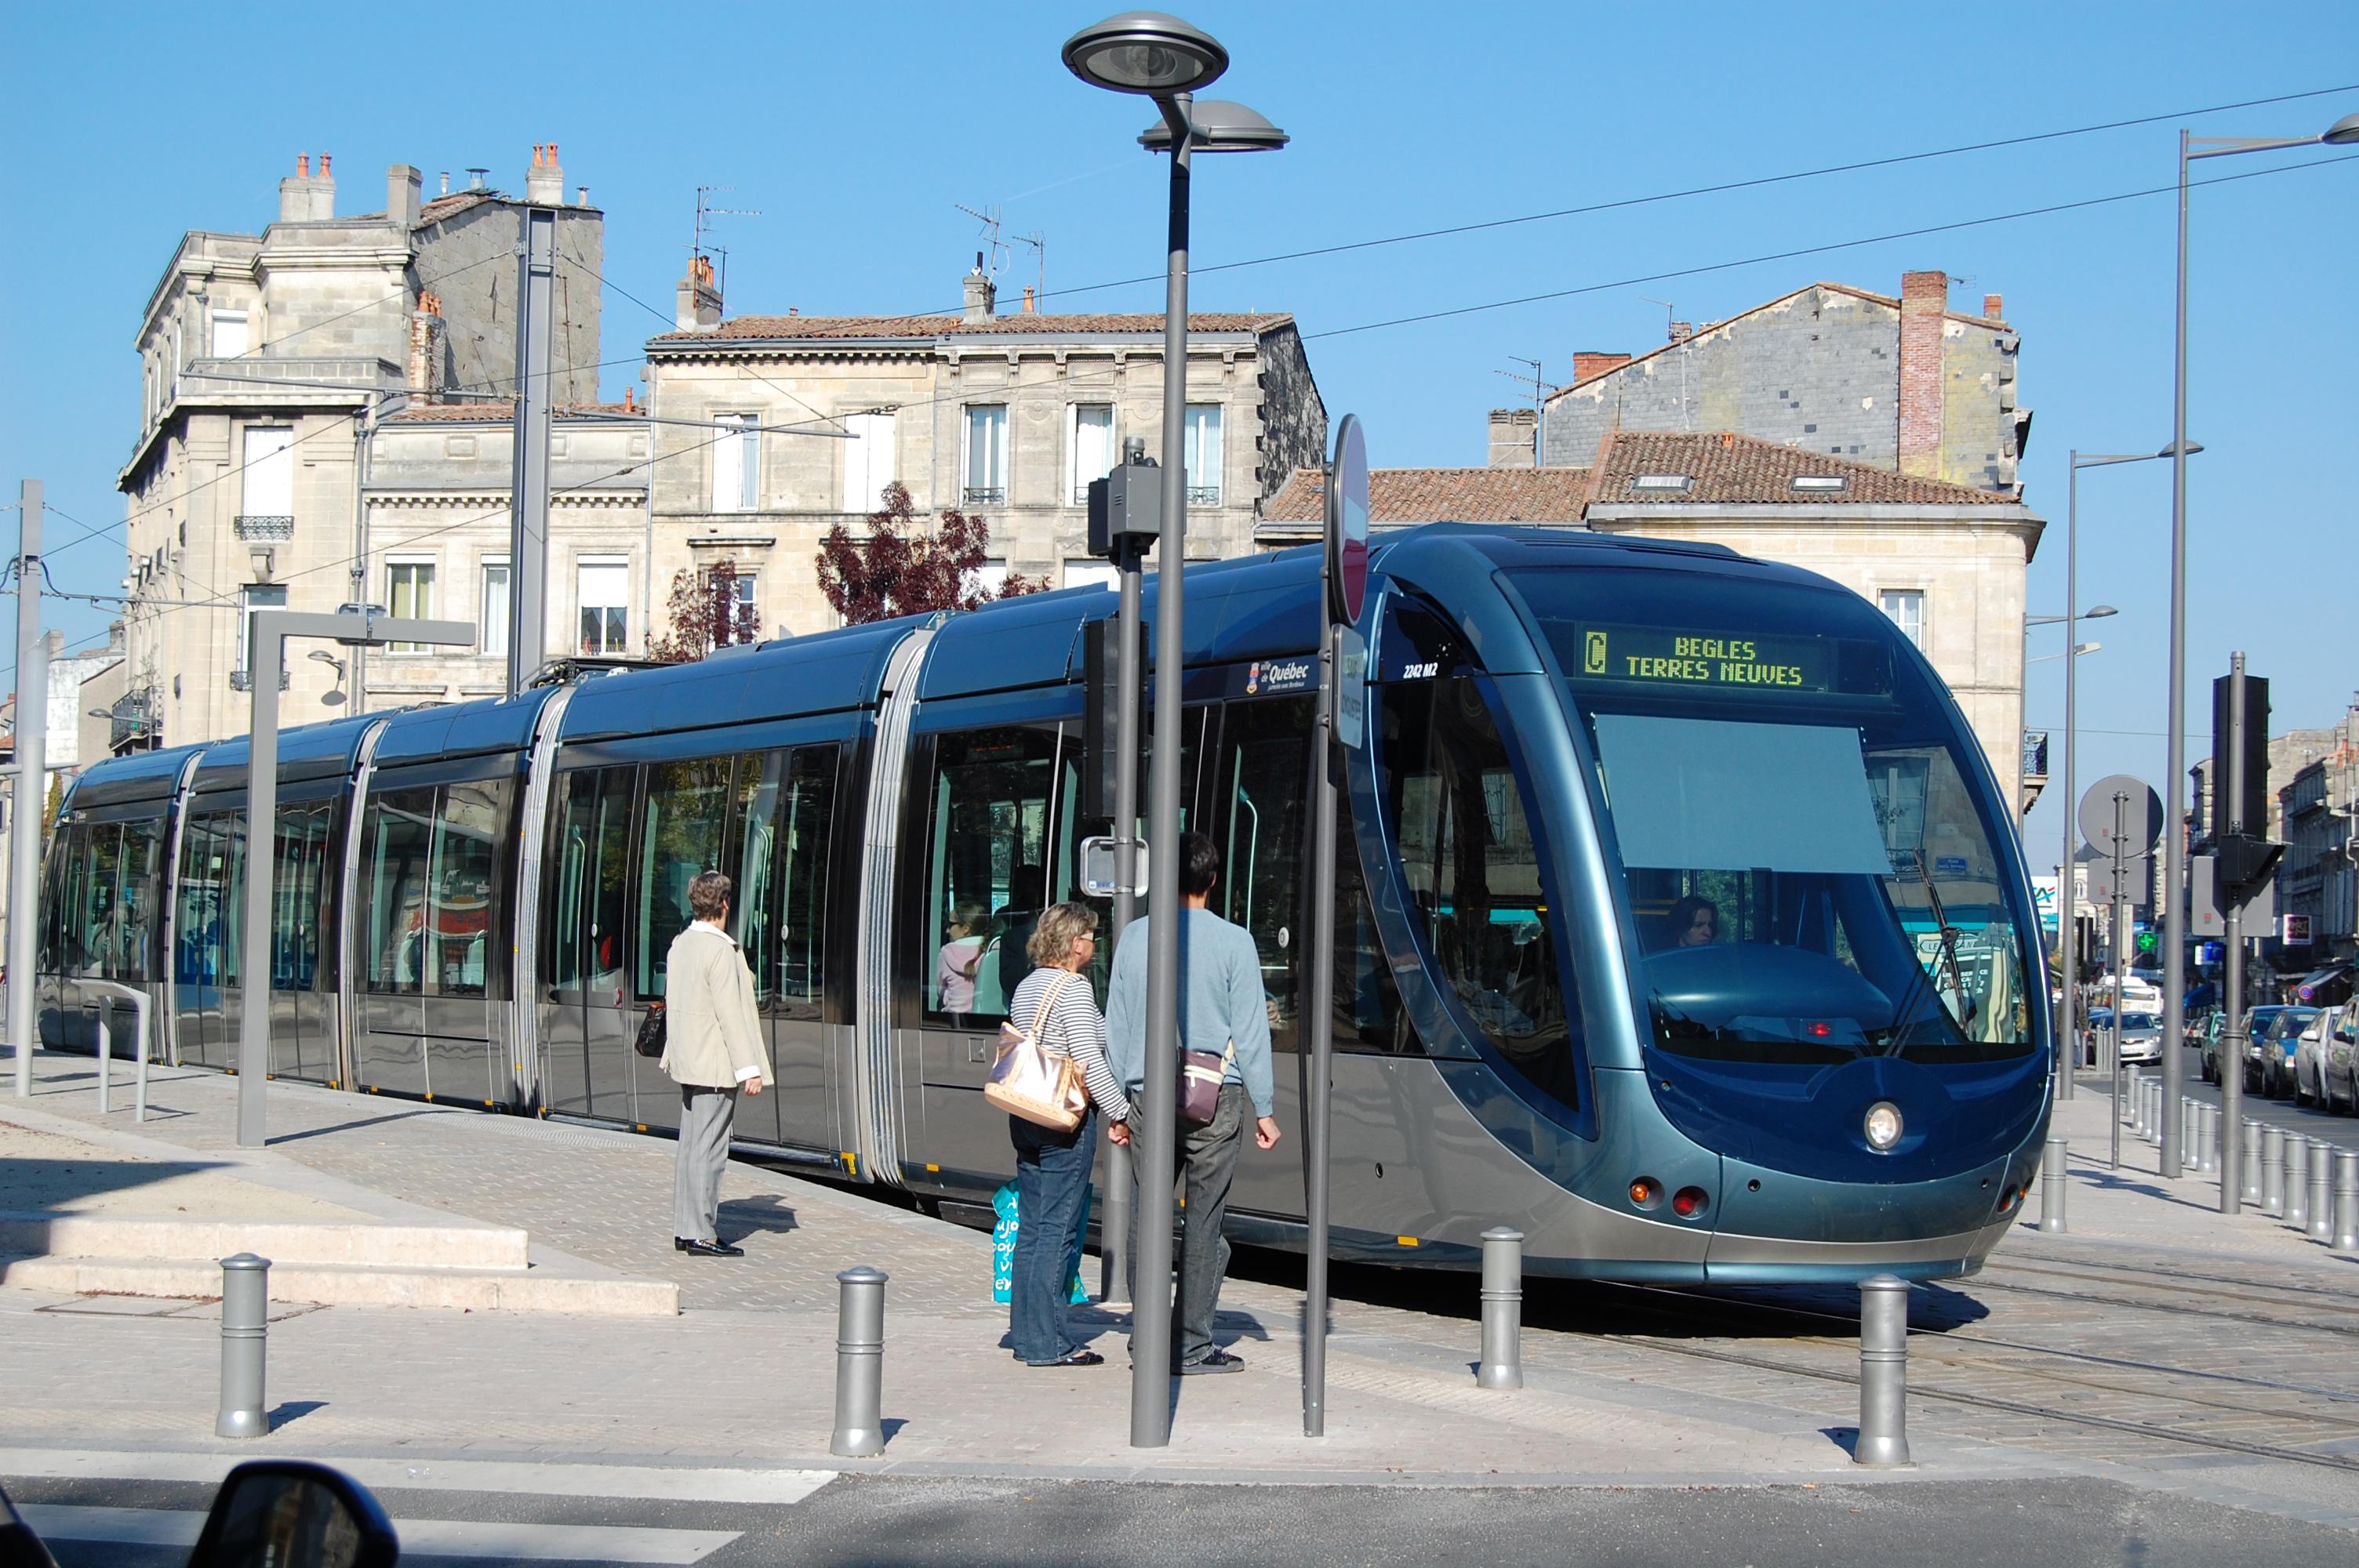 file xdsc 7591 tramway de bordeaux place paul wikimedia commons. Black Bedroom Furniture Sets. Home Design Ideas